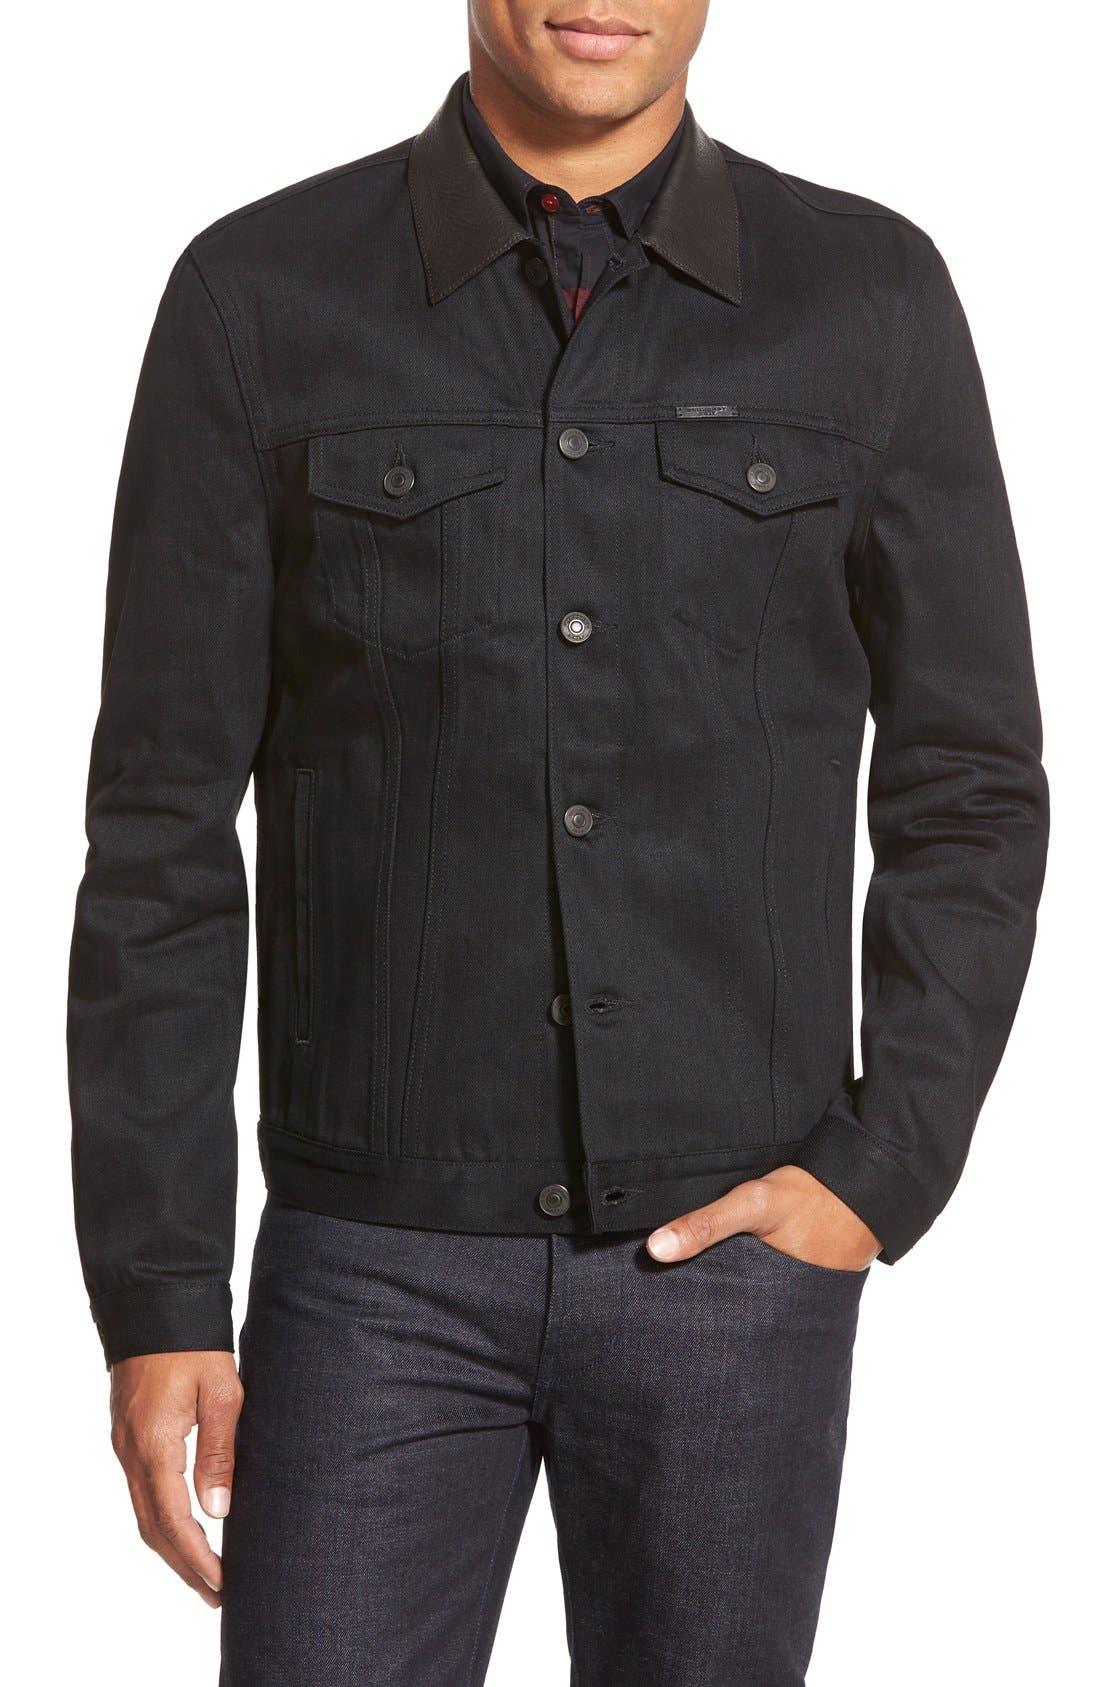 BURBERRY Brit 'Skipper' Trim Fit Denim Jacket with Leather Collar, Main, color, 001